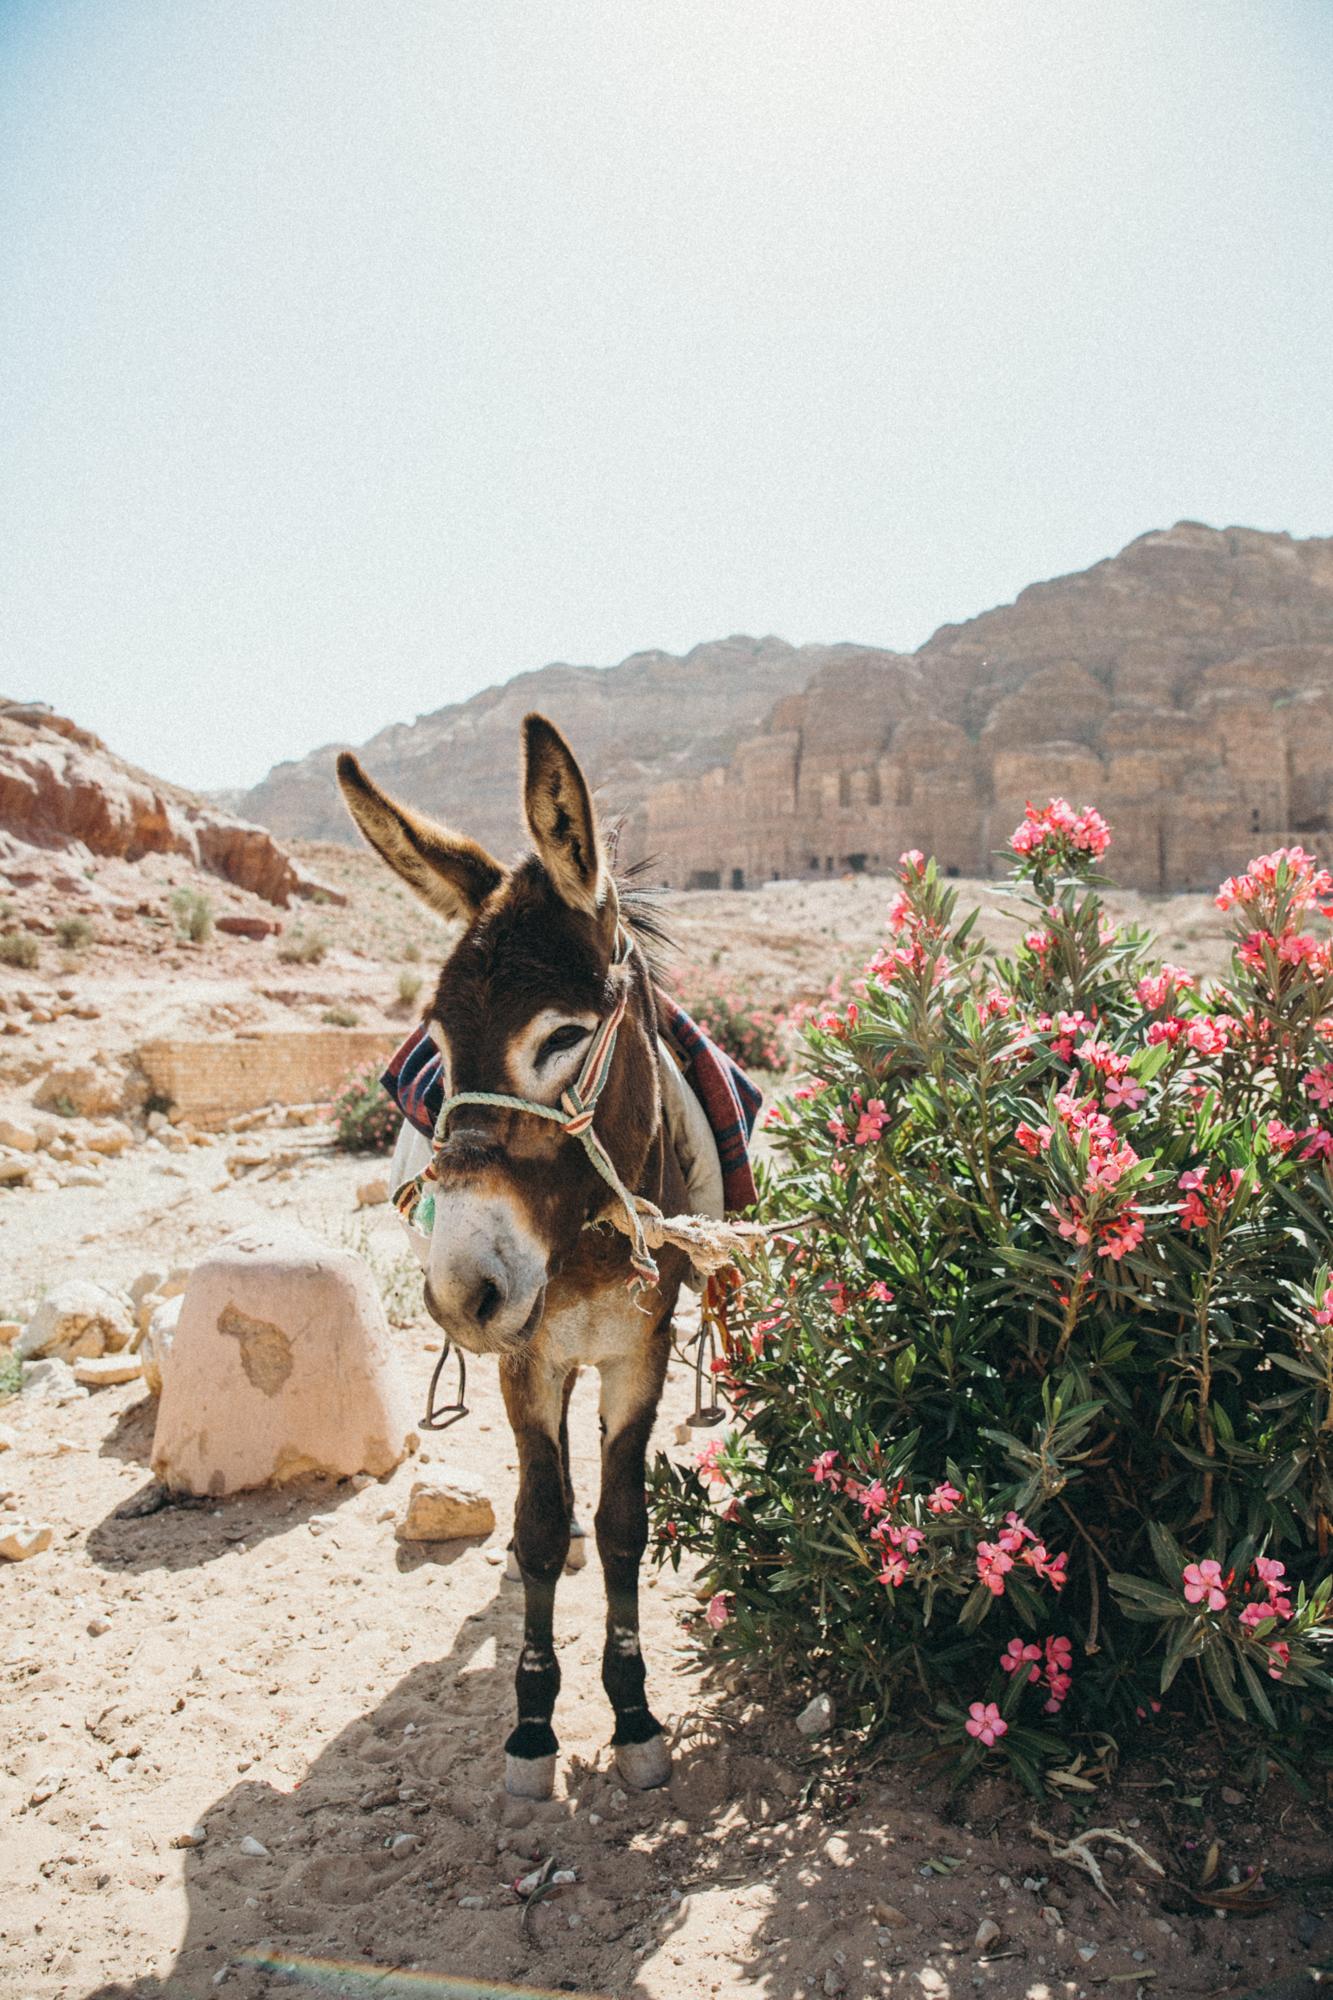 Cute lil donkey! They were everywhere.